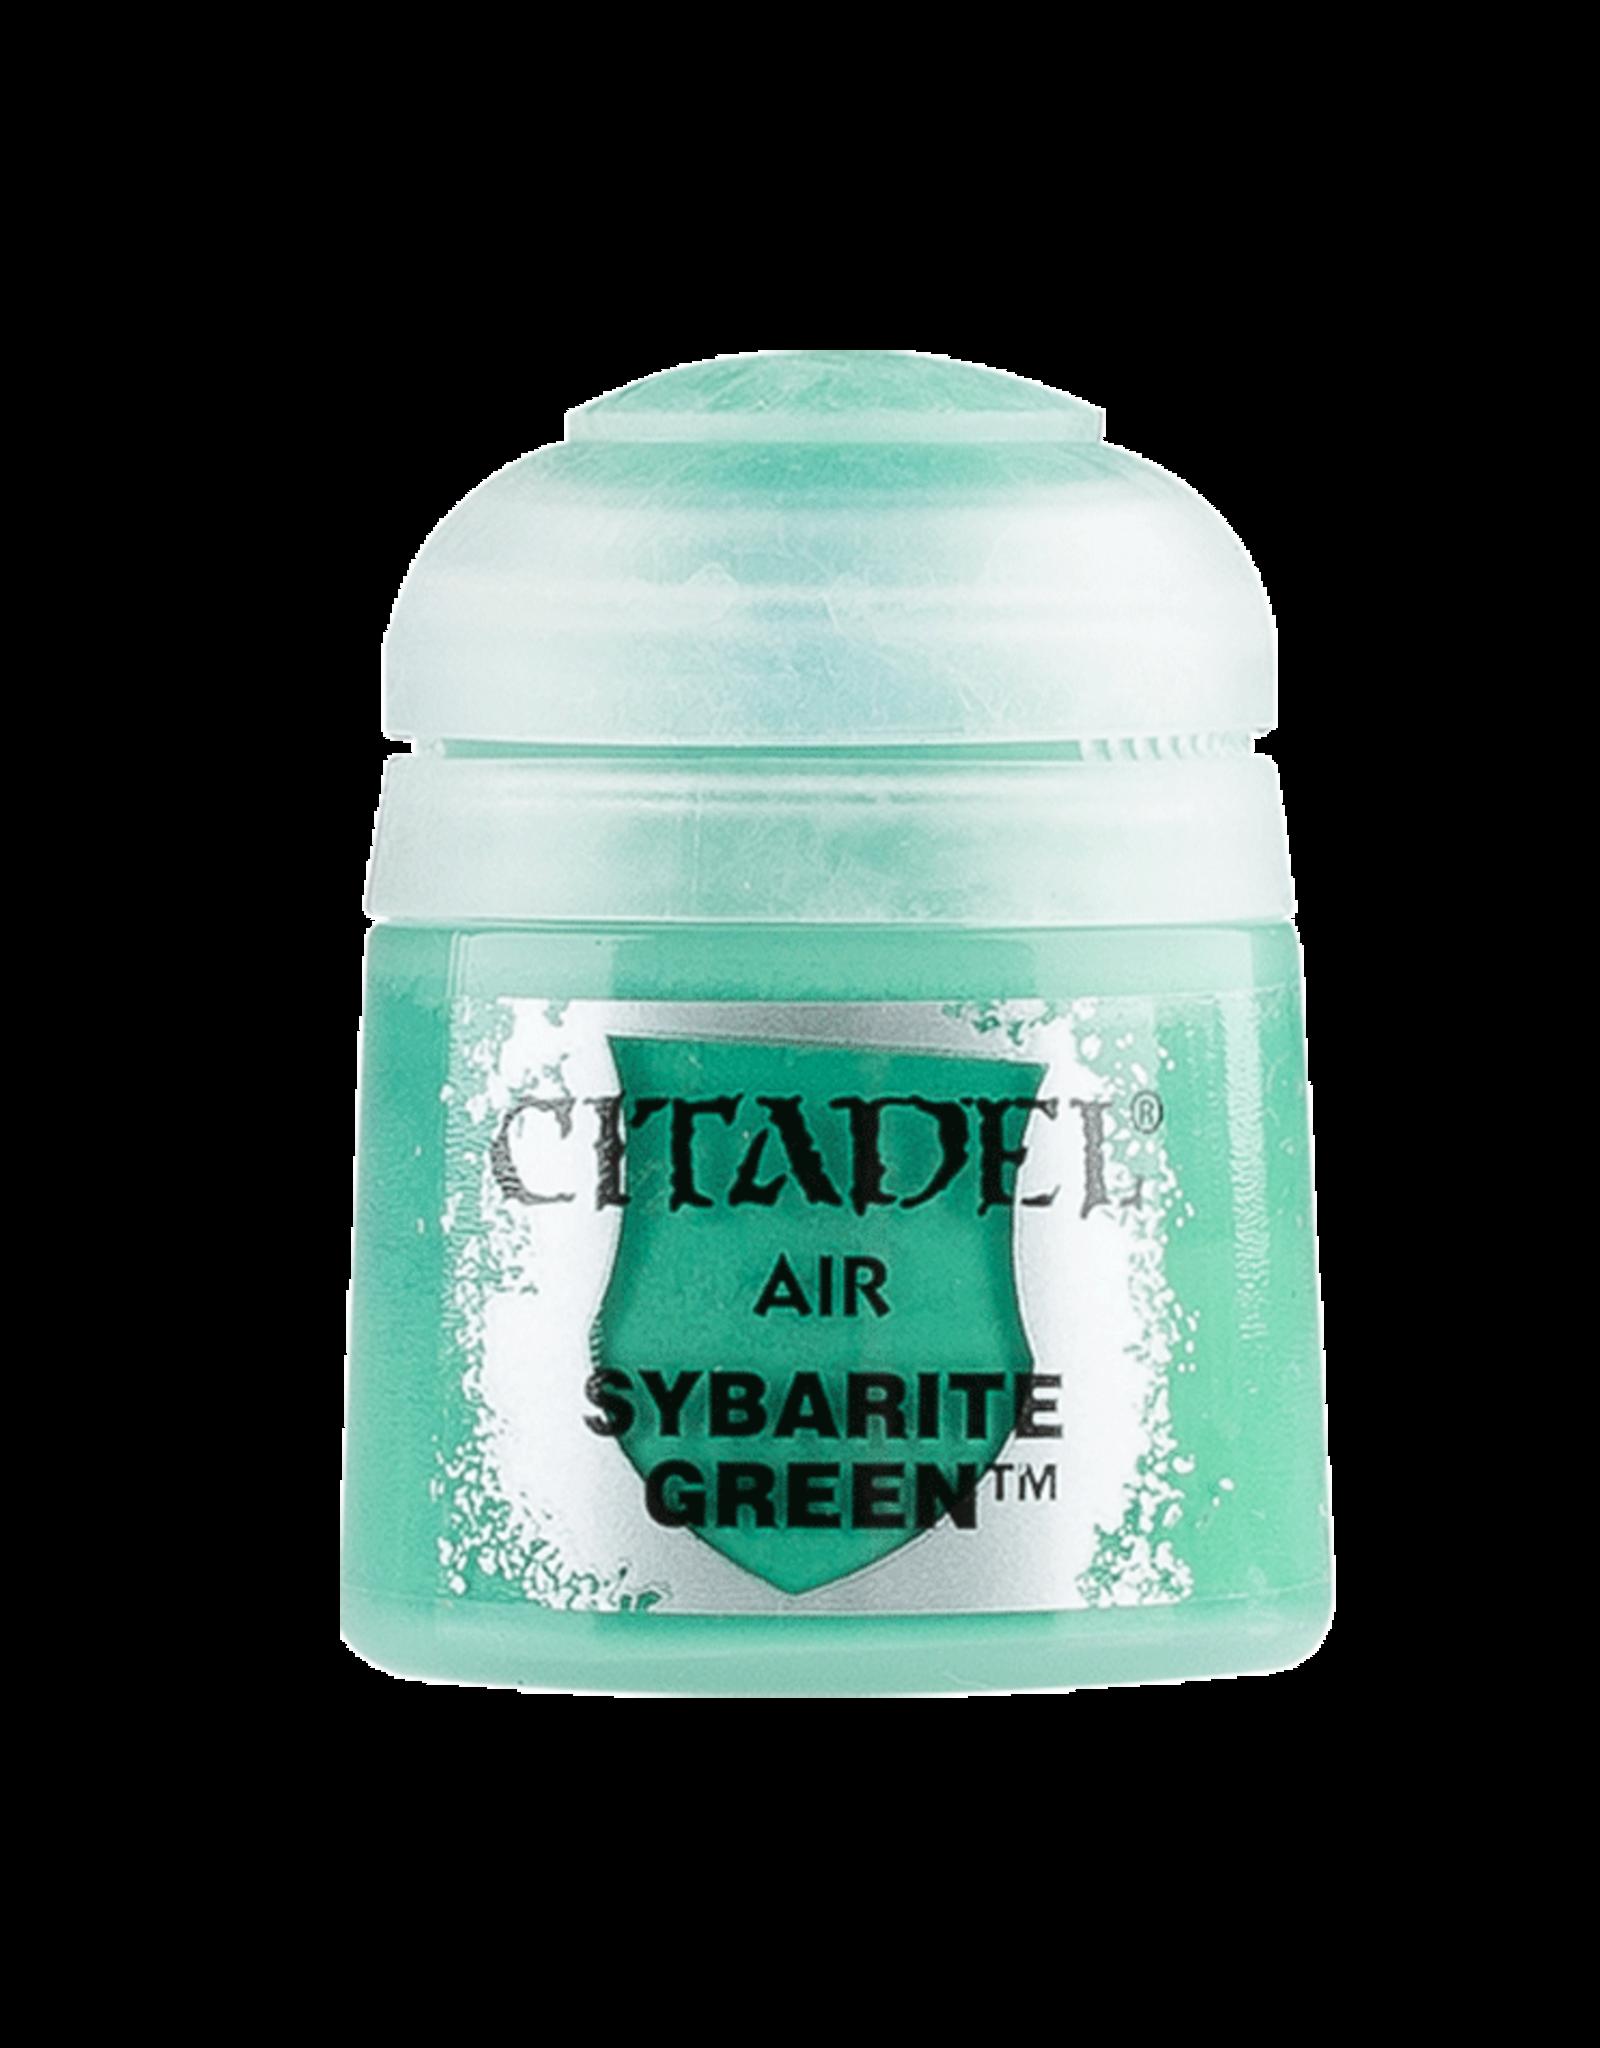 Games Workshop Citadel Air: Sybarite Green (24ml)